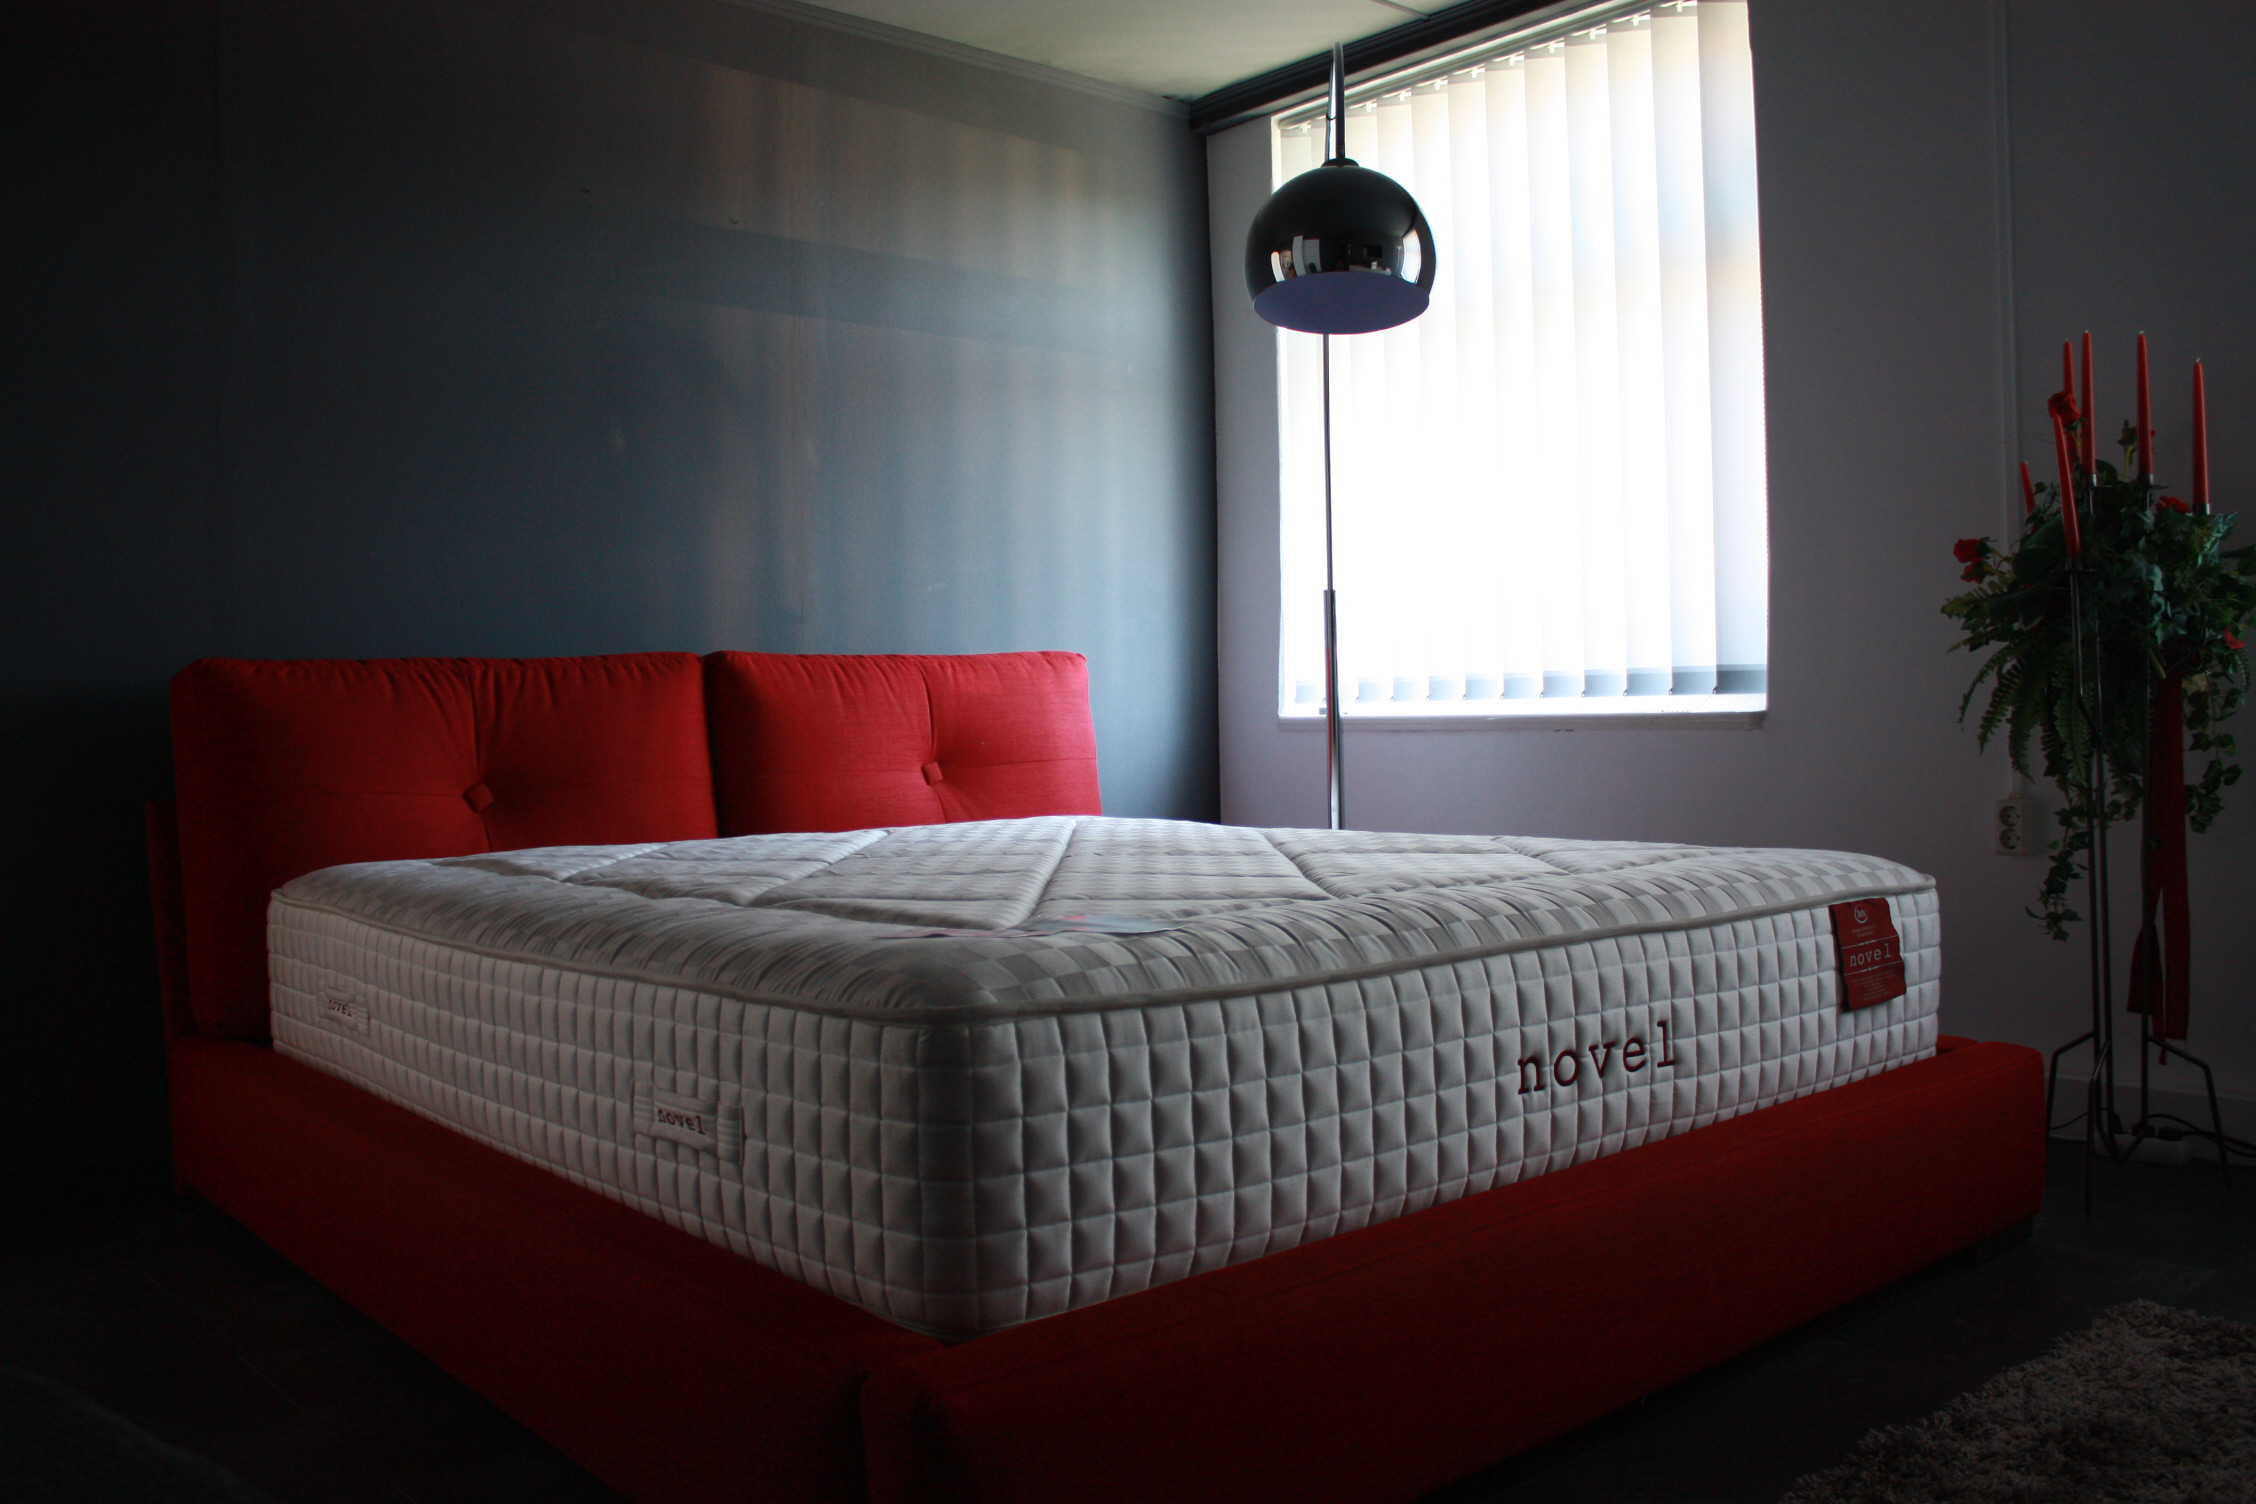 bett liegehhe 60 cm elegant meise mbel hip hop xcm with bett liegehhe 60 cm concept me von. Black Bedroom Furniture Sets. Home Design Ideas